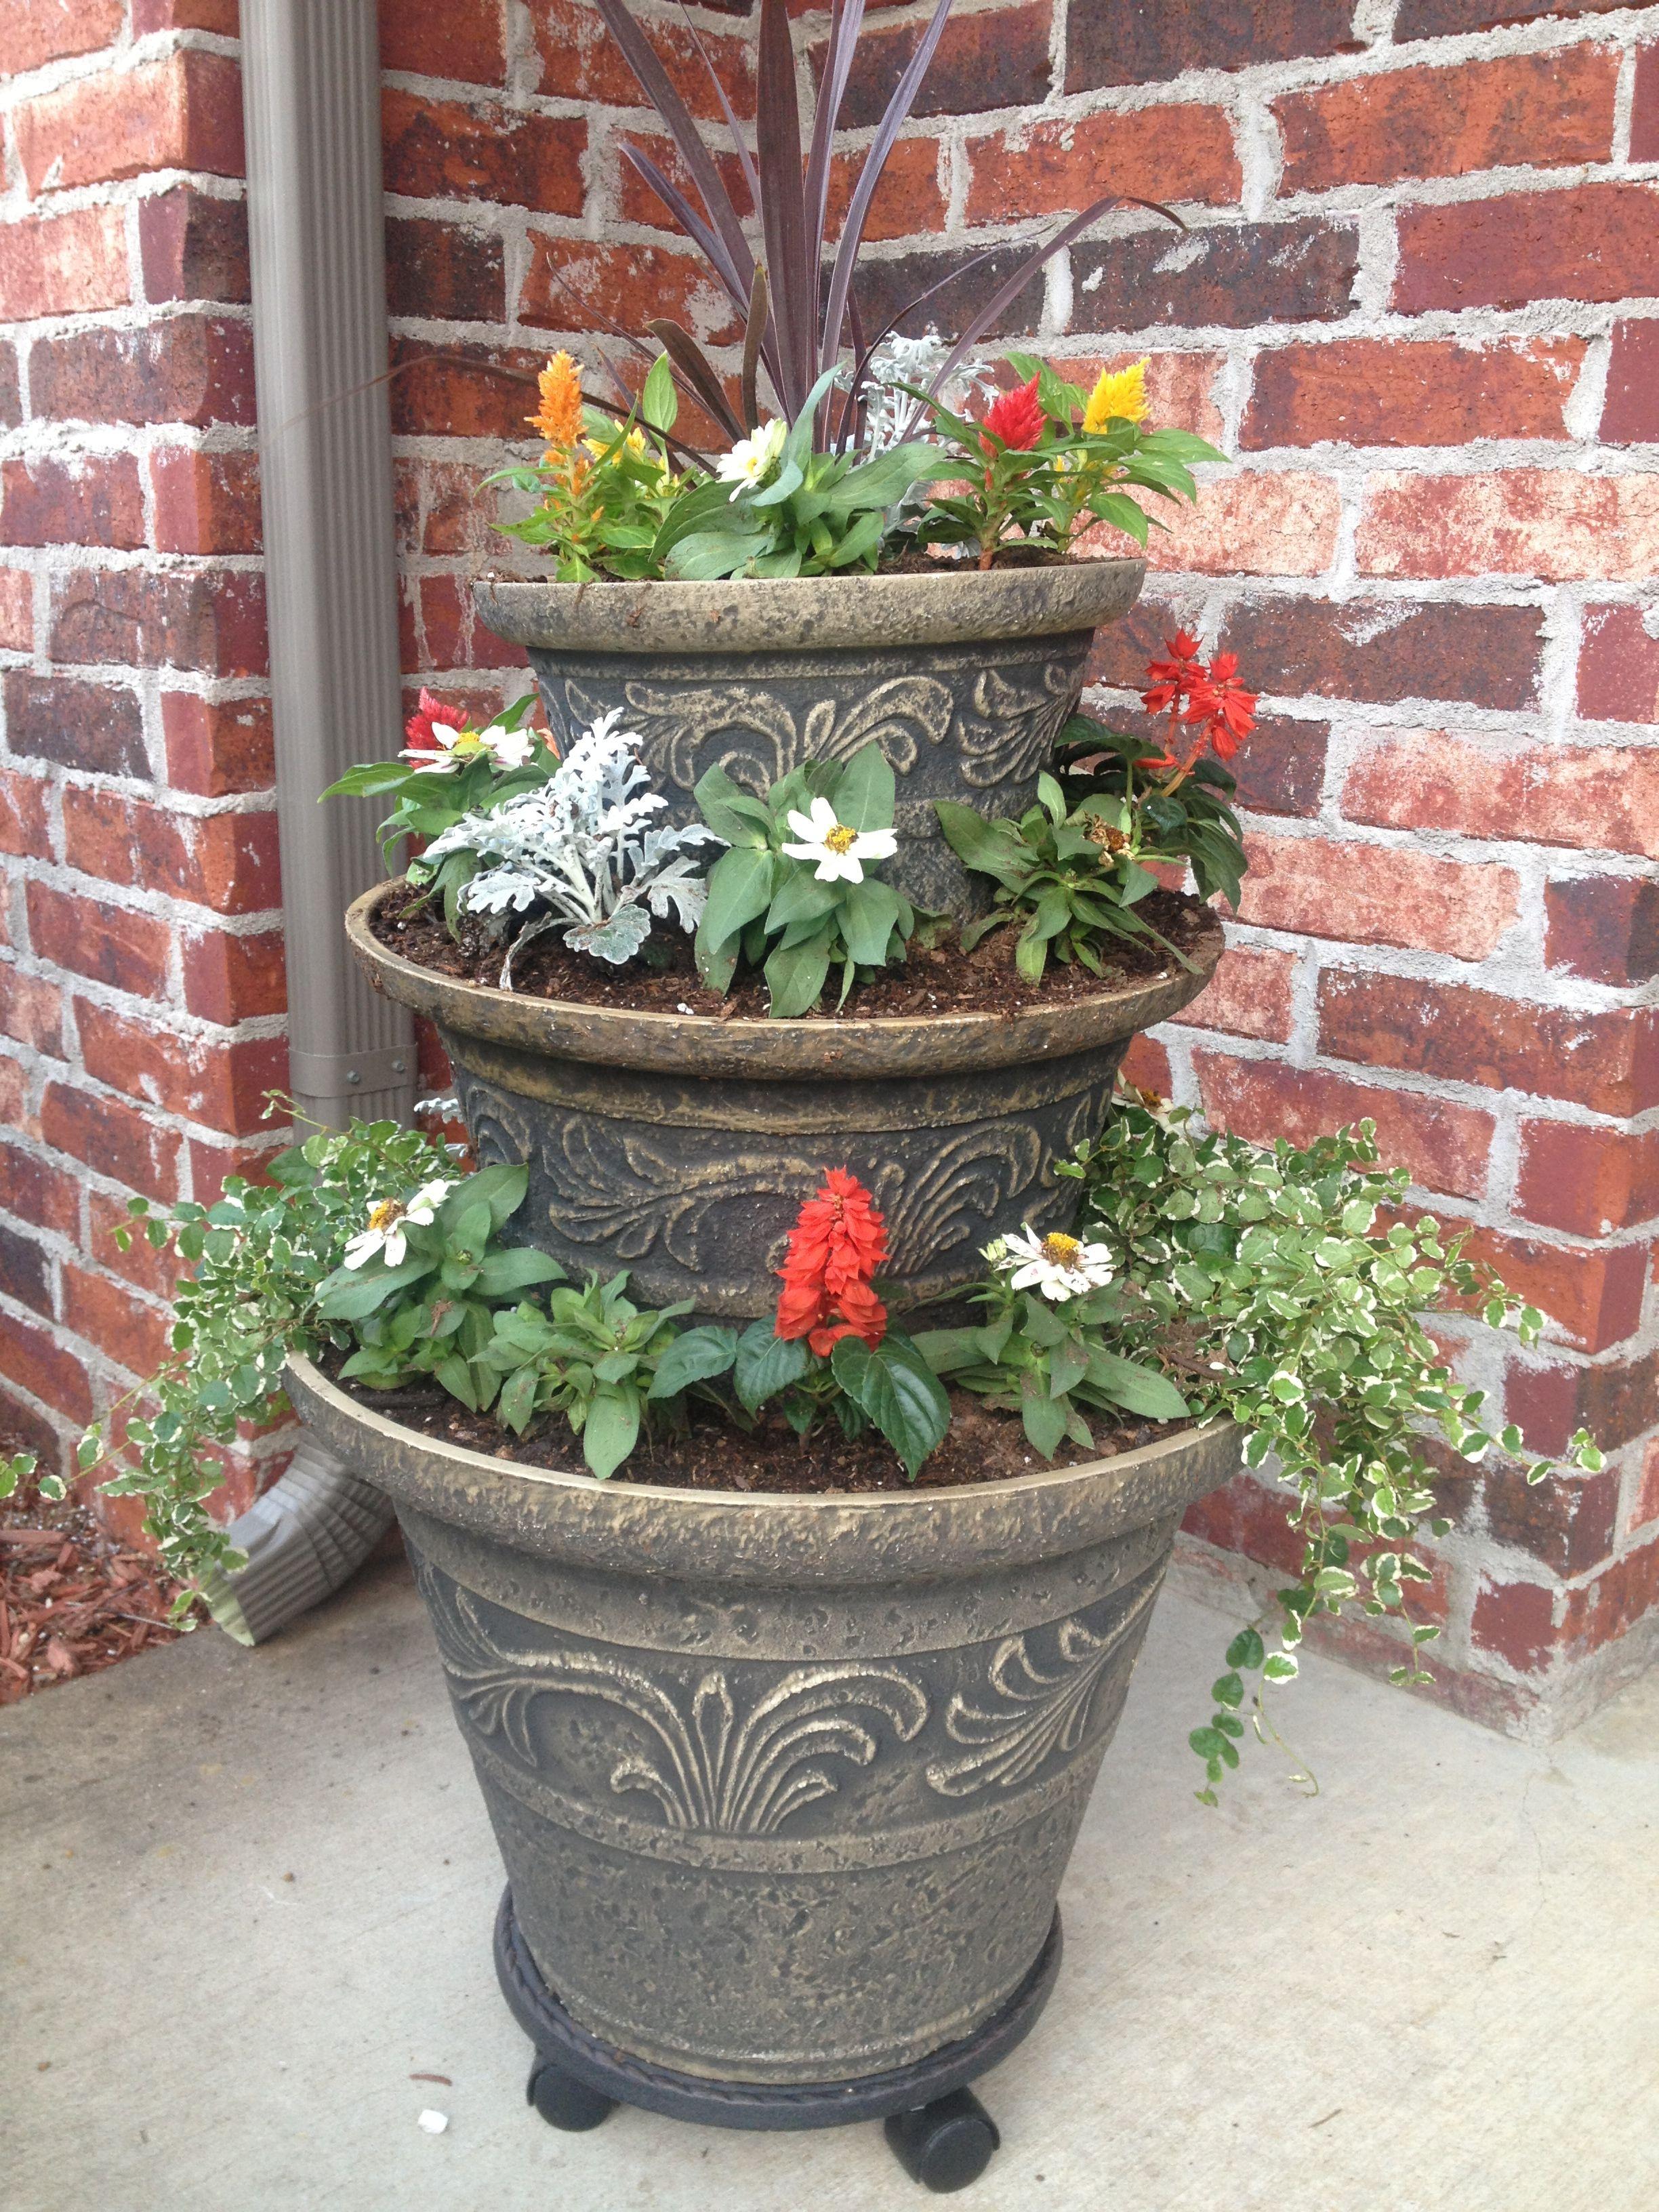 3 Tier Planter. Love Flower Pots Tiered